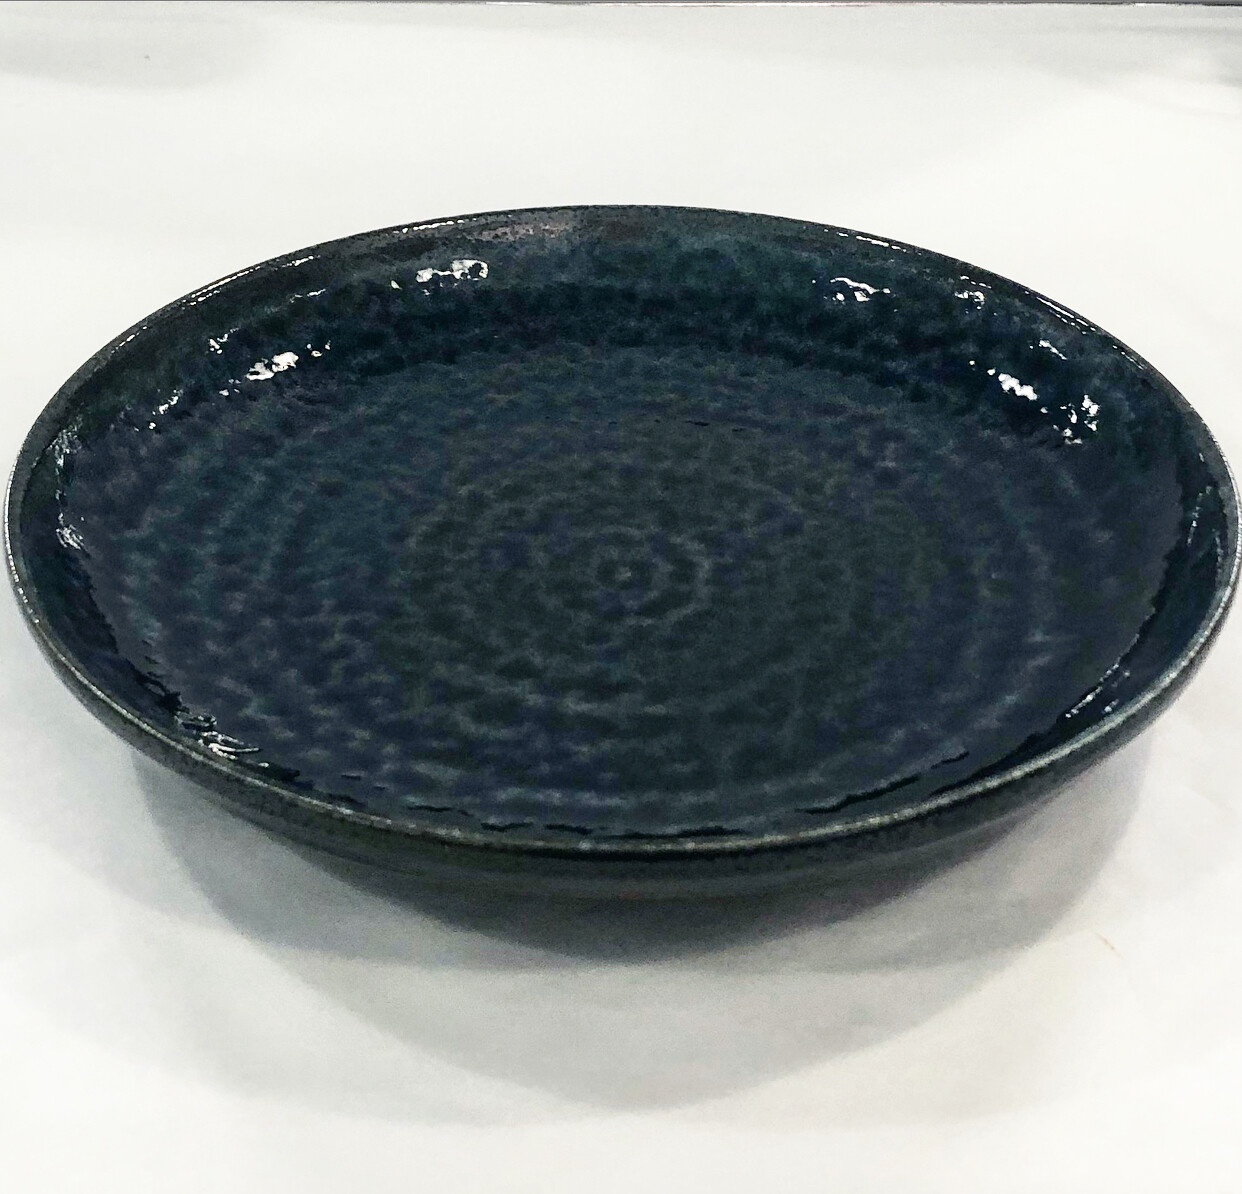 CONCEPT JAPAN  FD28-1BL-IROYU Blue DINNER PLATE  24.5 x 3cm